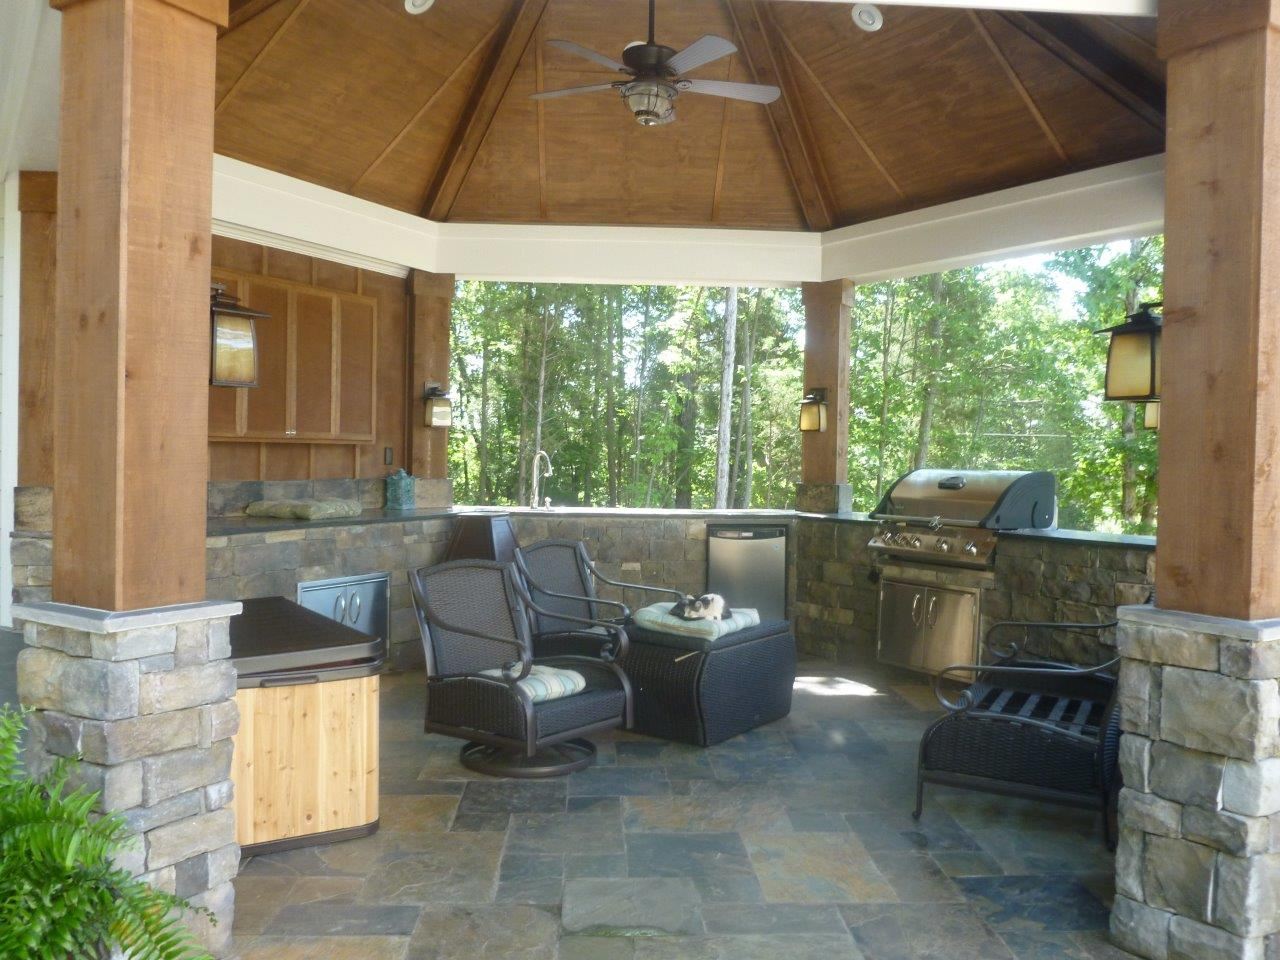 Blog archadeck outdoor living for Outdoor kitchen under deck